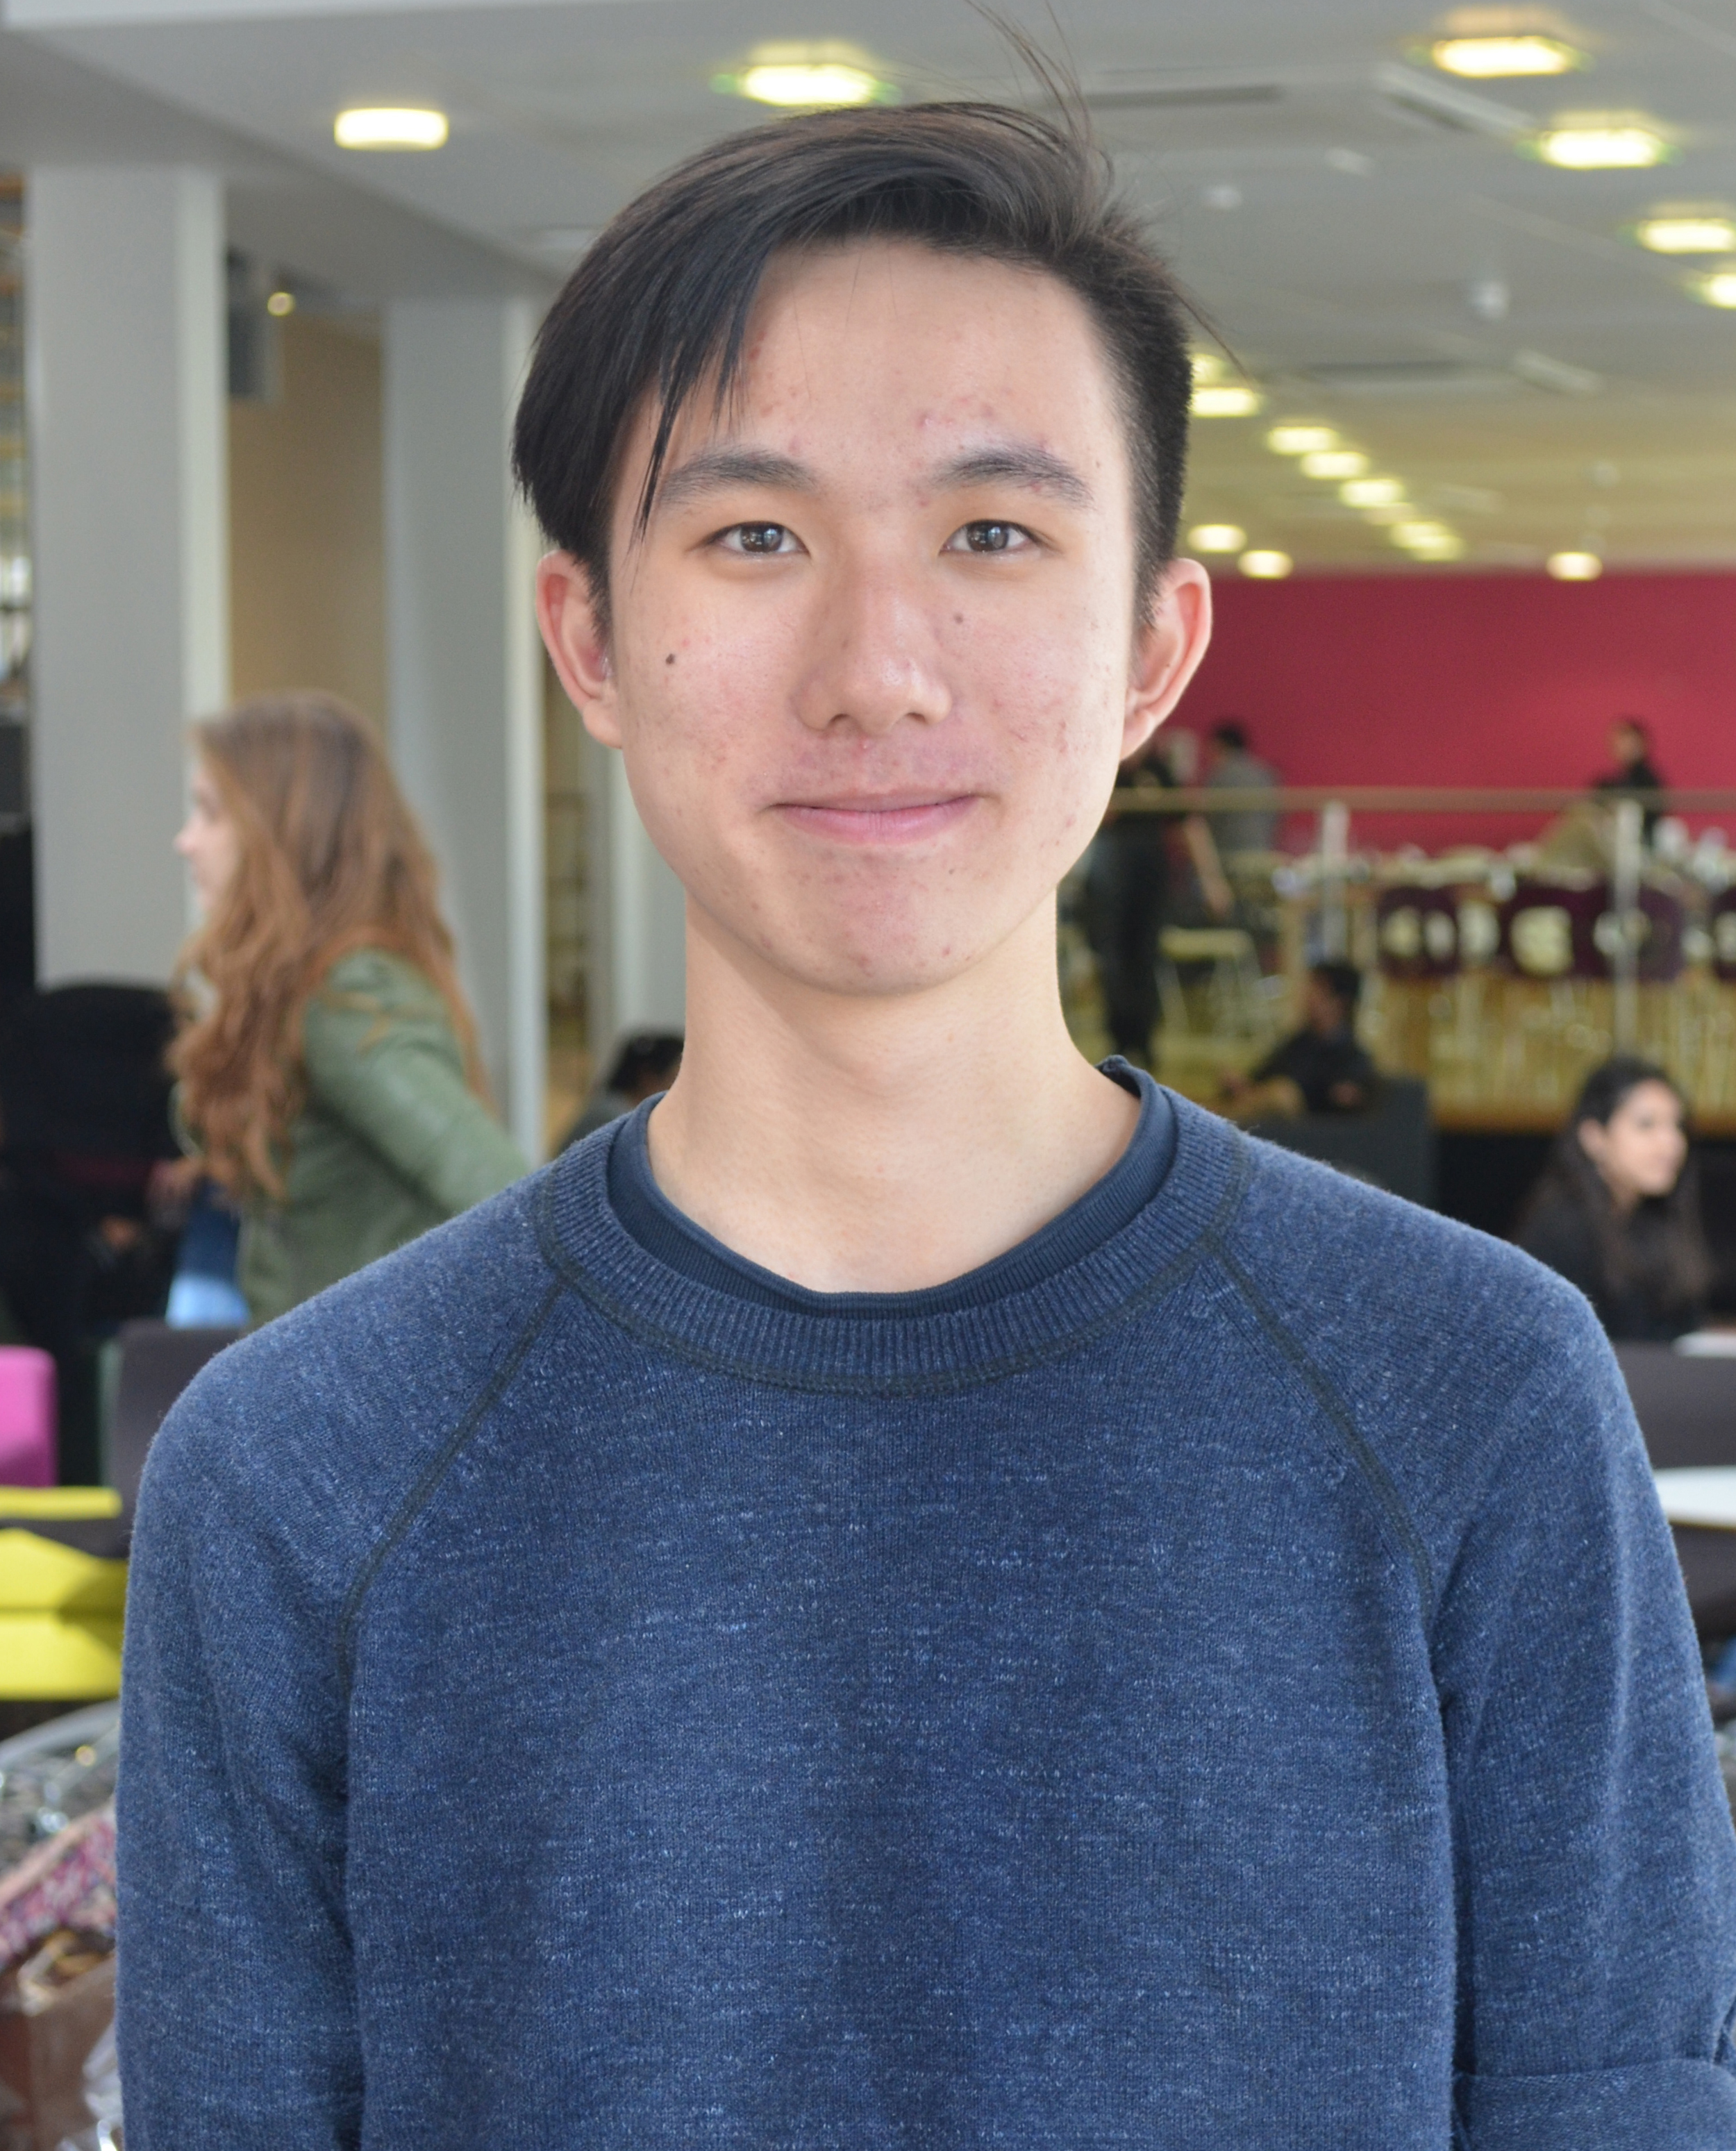 Photo of international student Tian at INTO Newcastle University